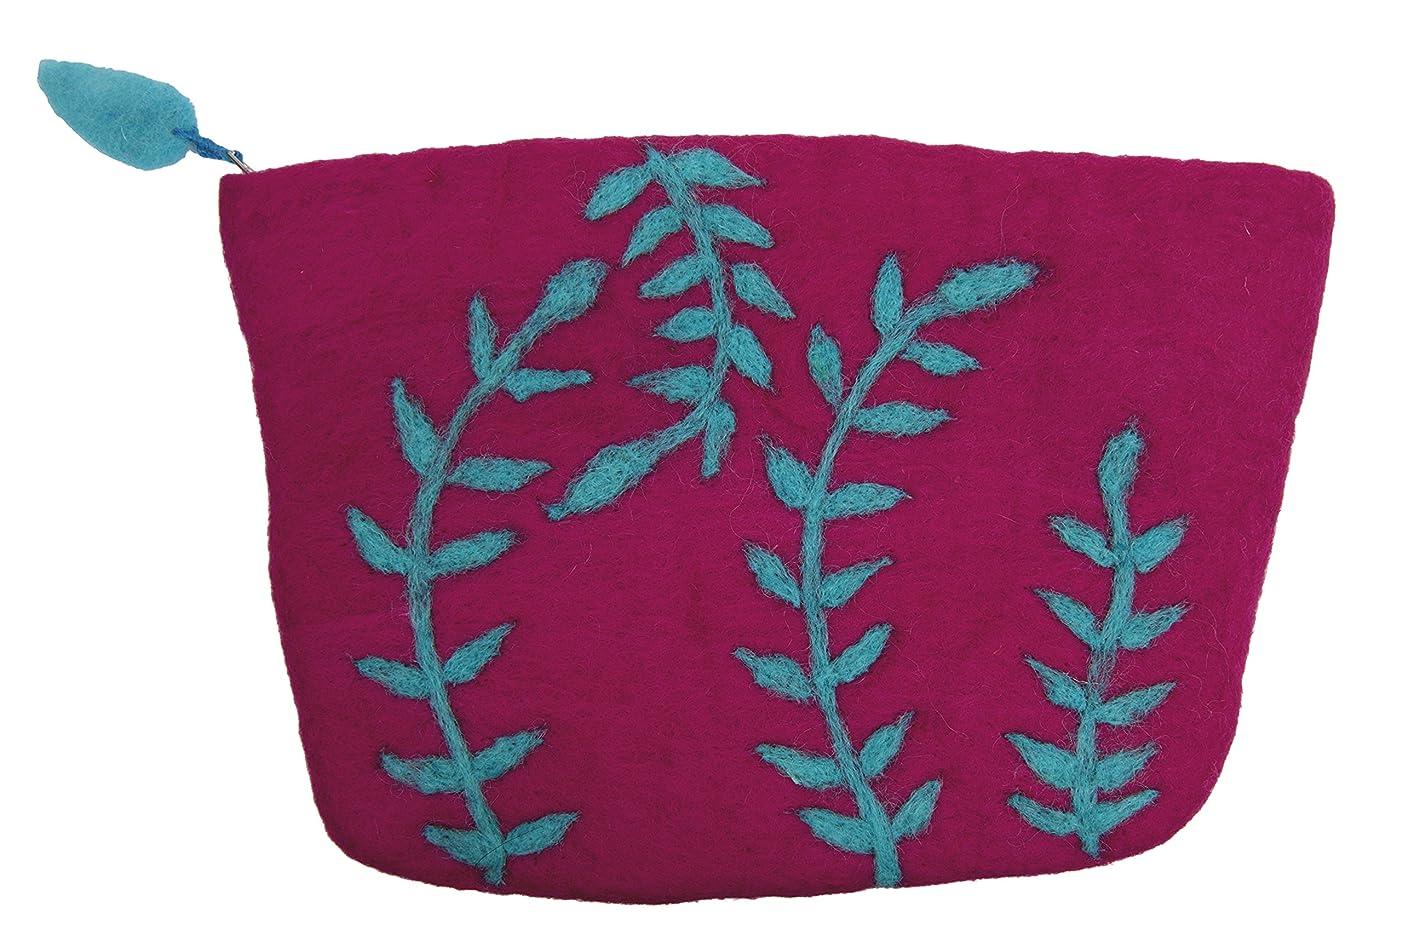 Frabjous Fibers Seagrass Notions or Needlecase Bag (Fuchsia)